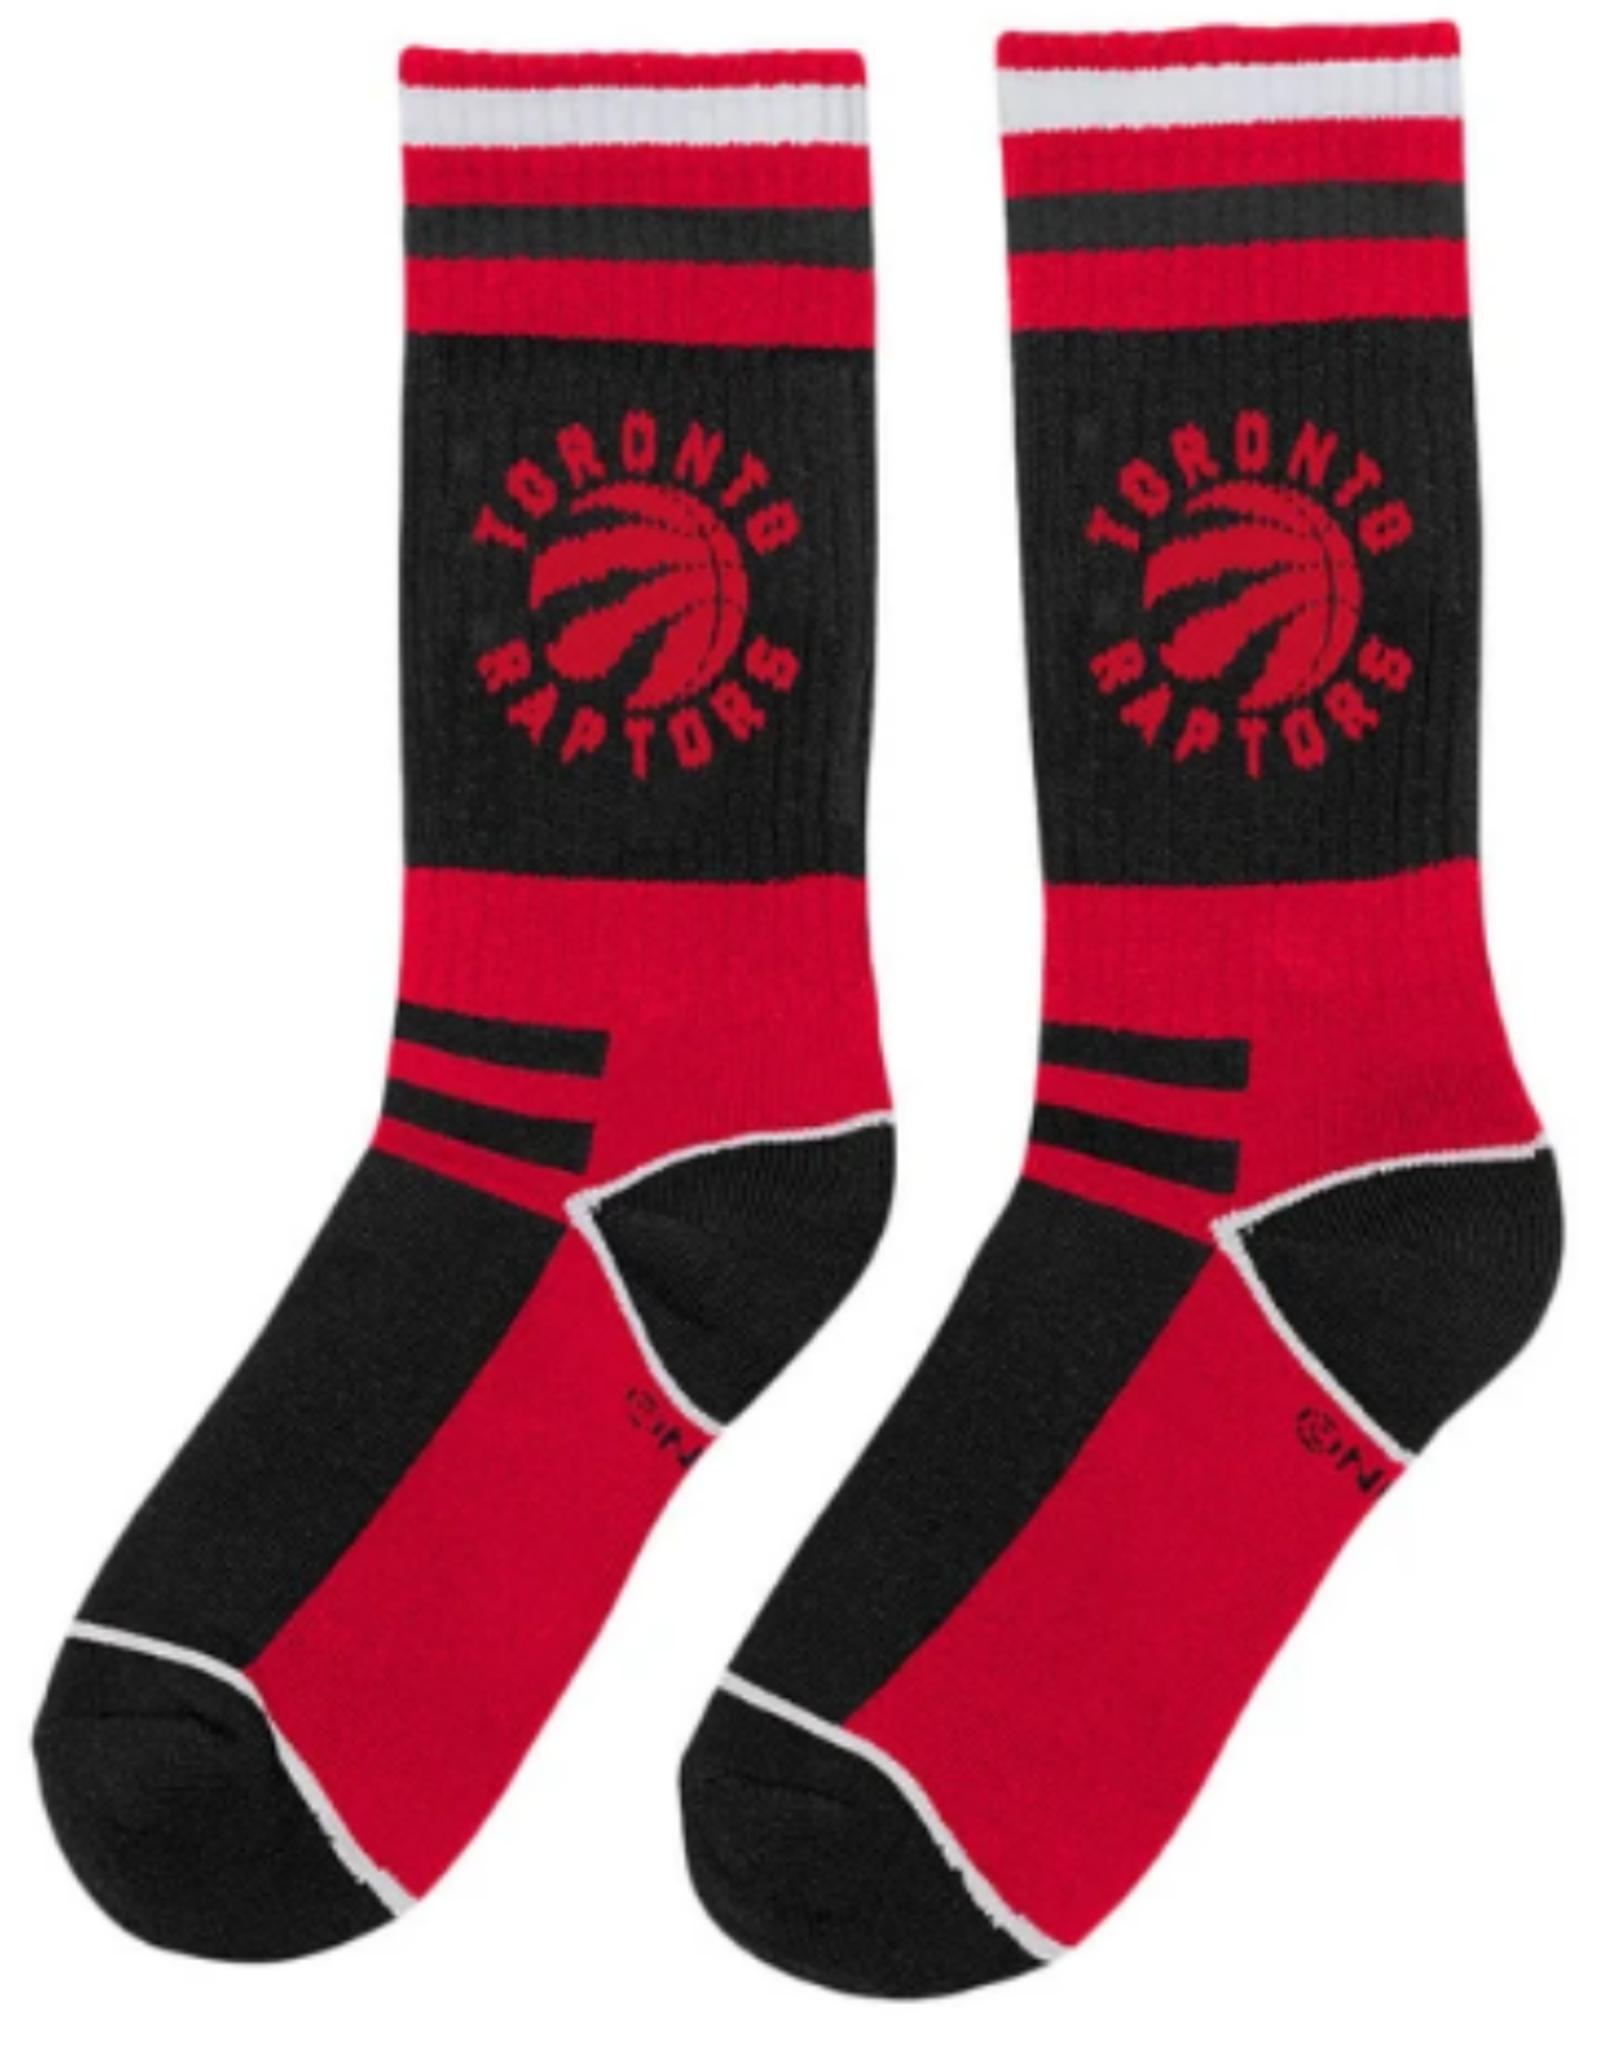 GEN2 Youth Socks 3 Pack Toronto Raptors